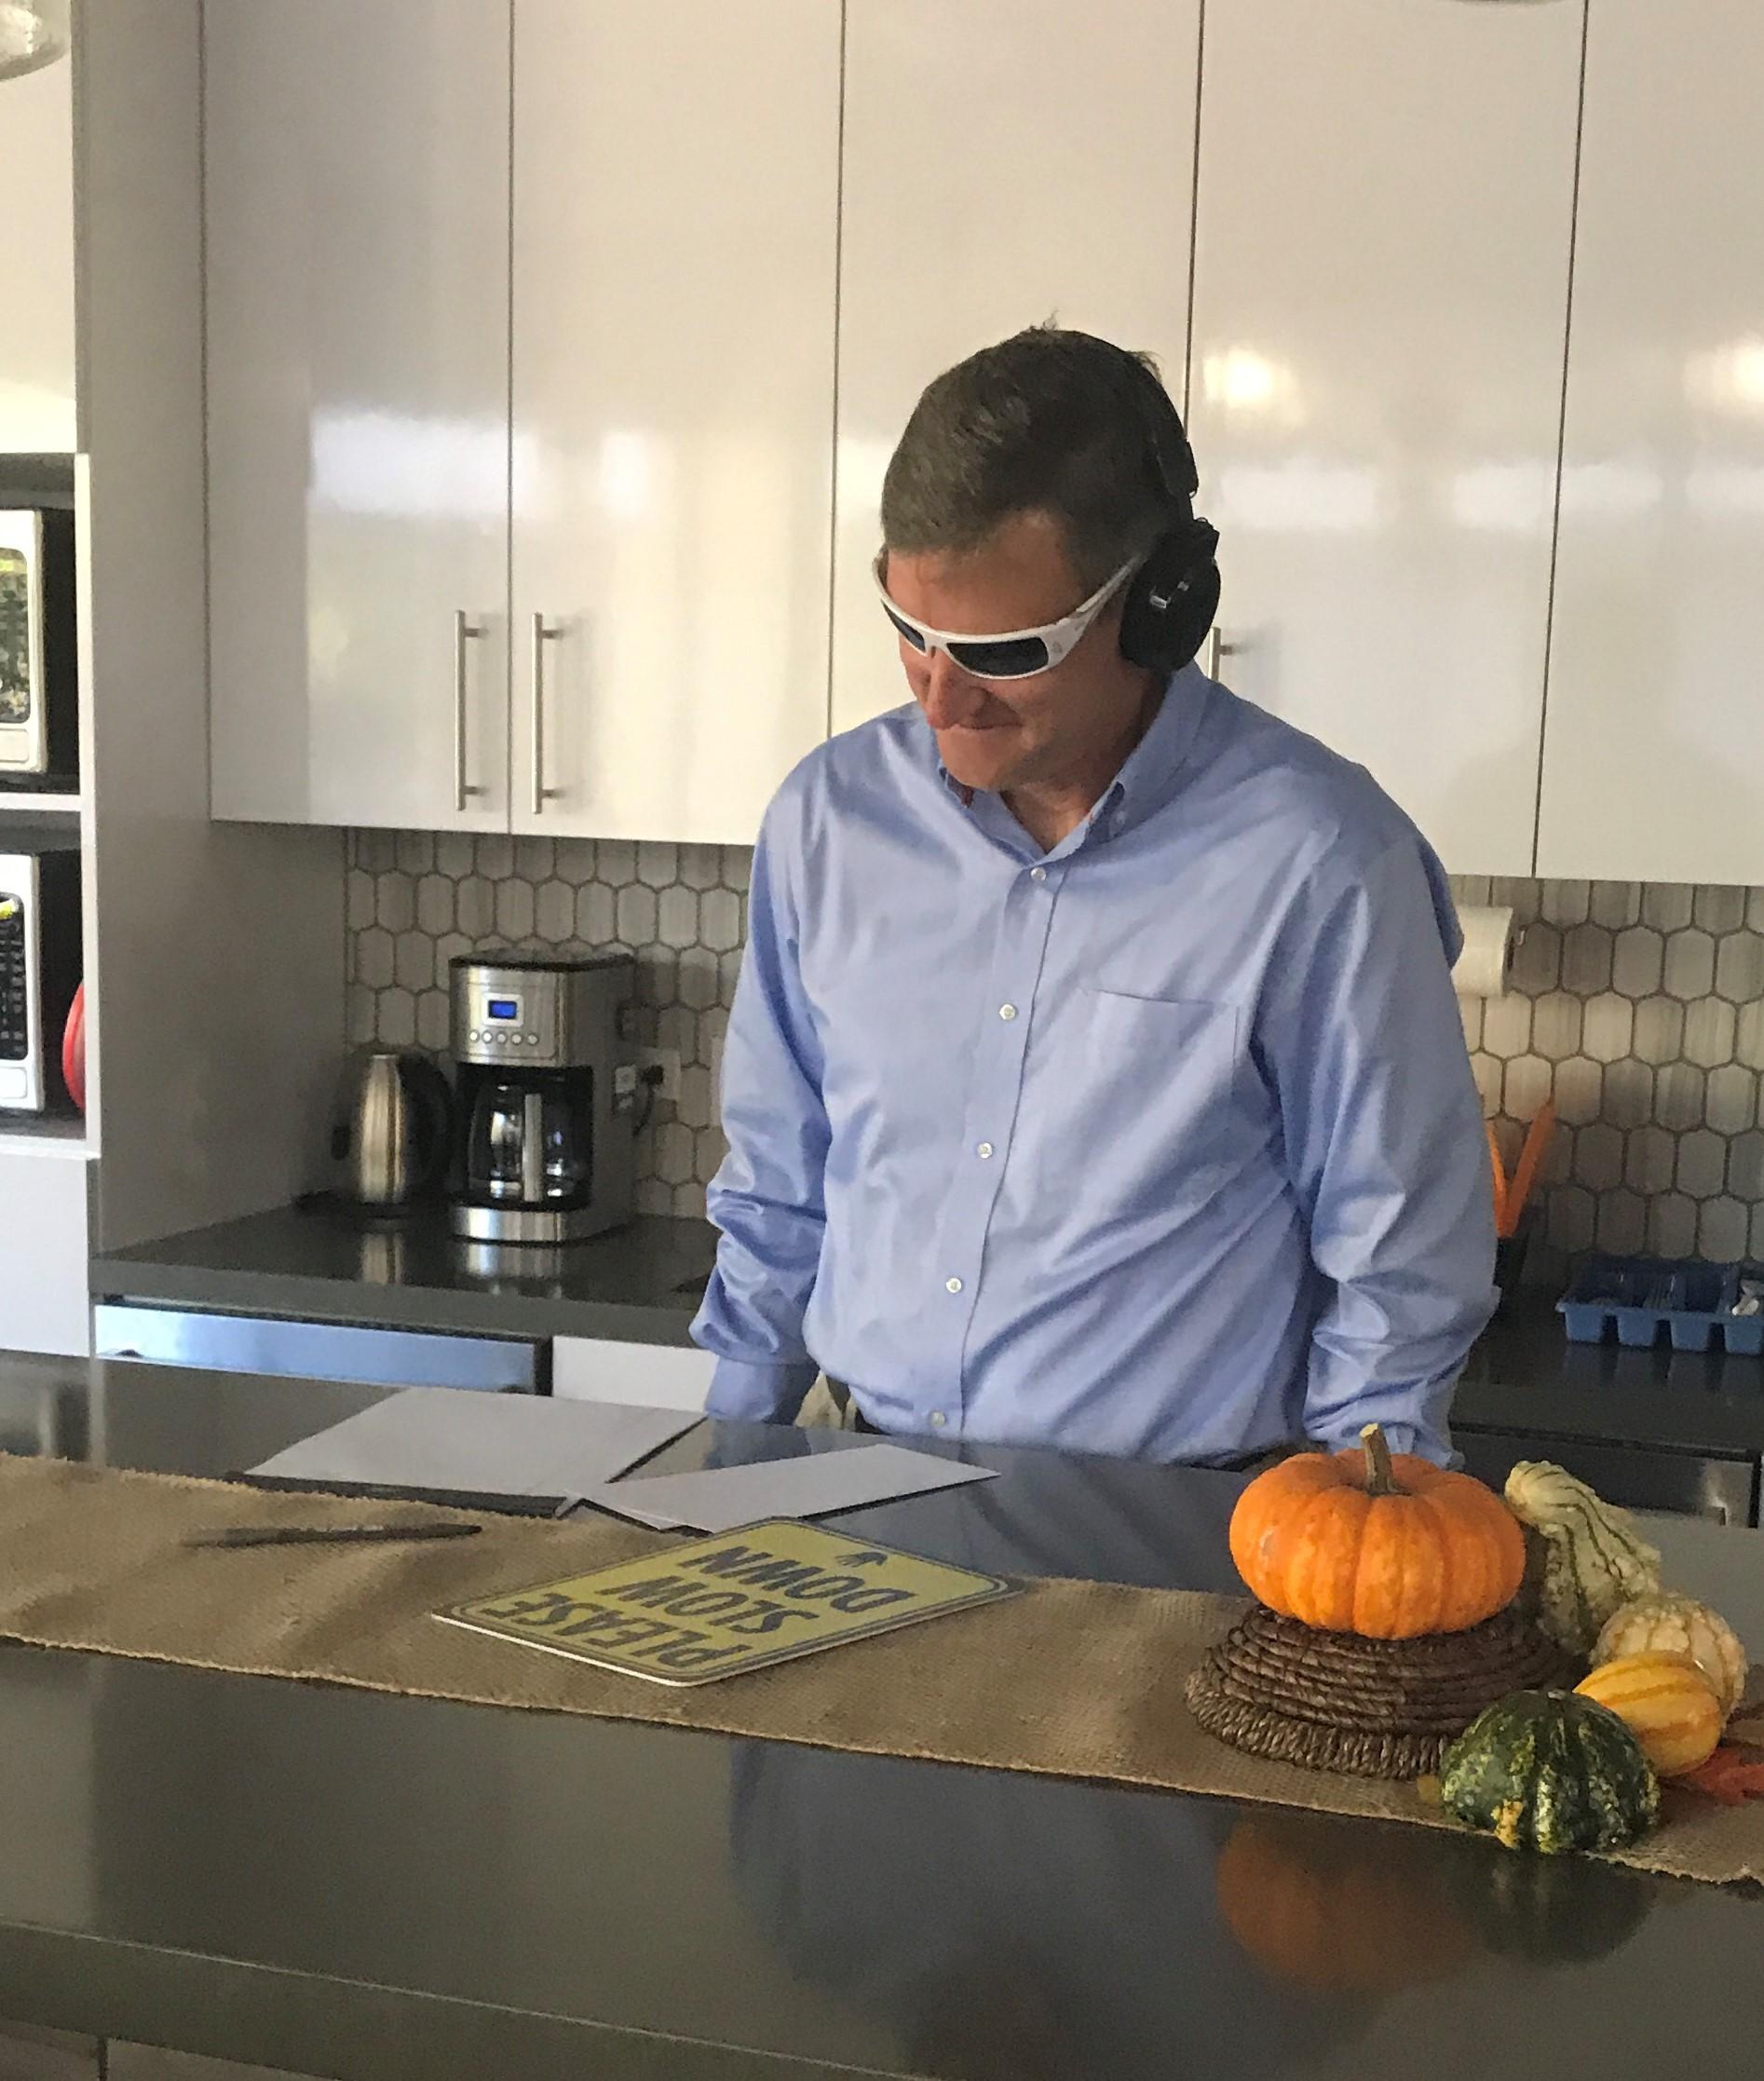 Vice President Mark going working through the Virtual Dementia Tasks